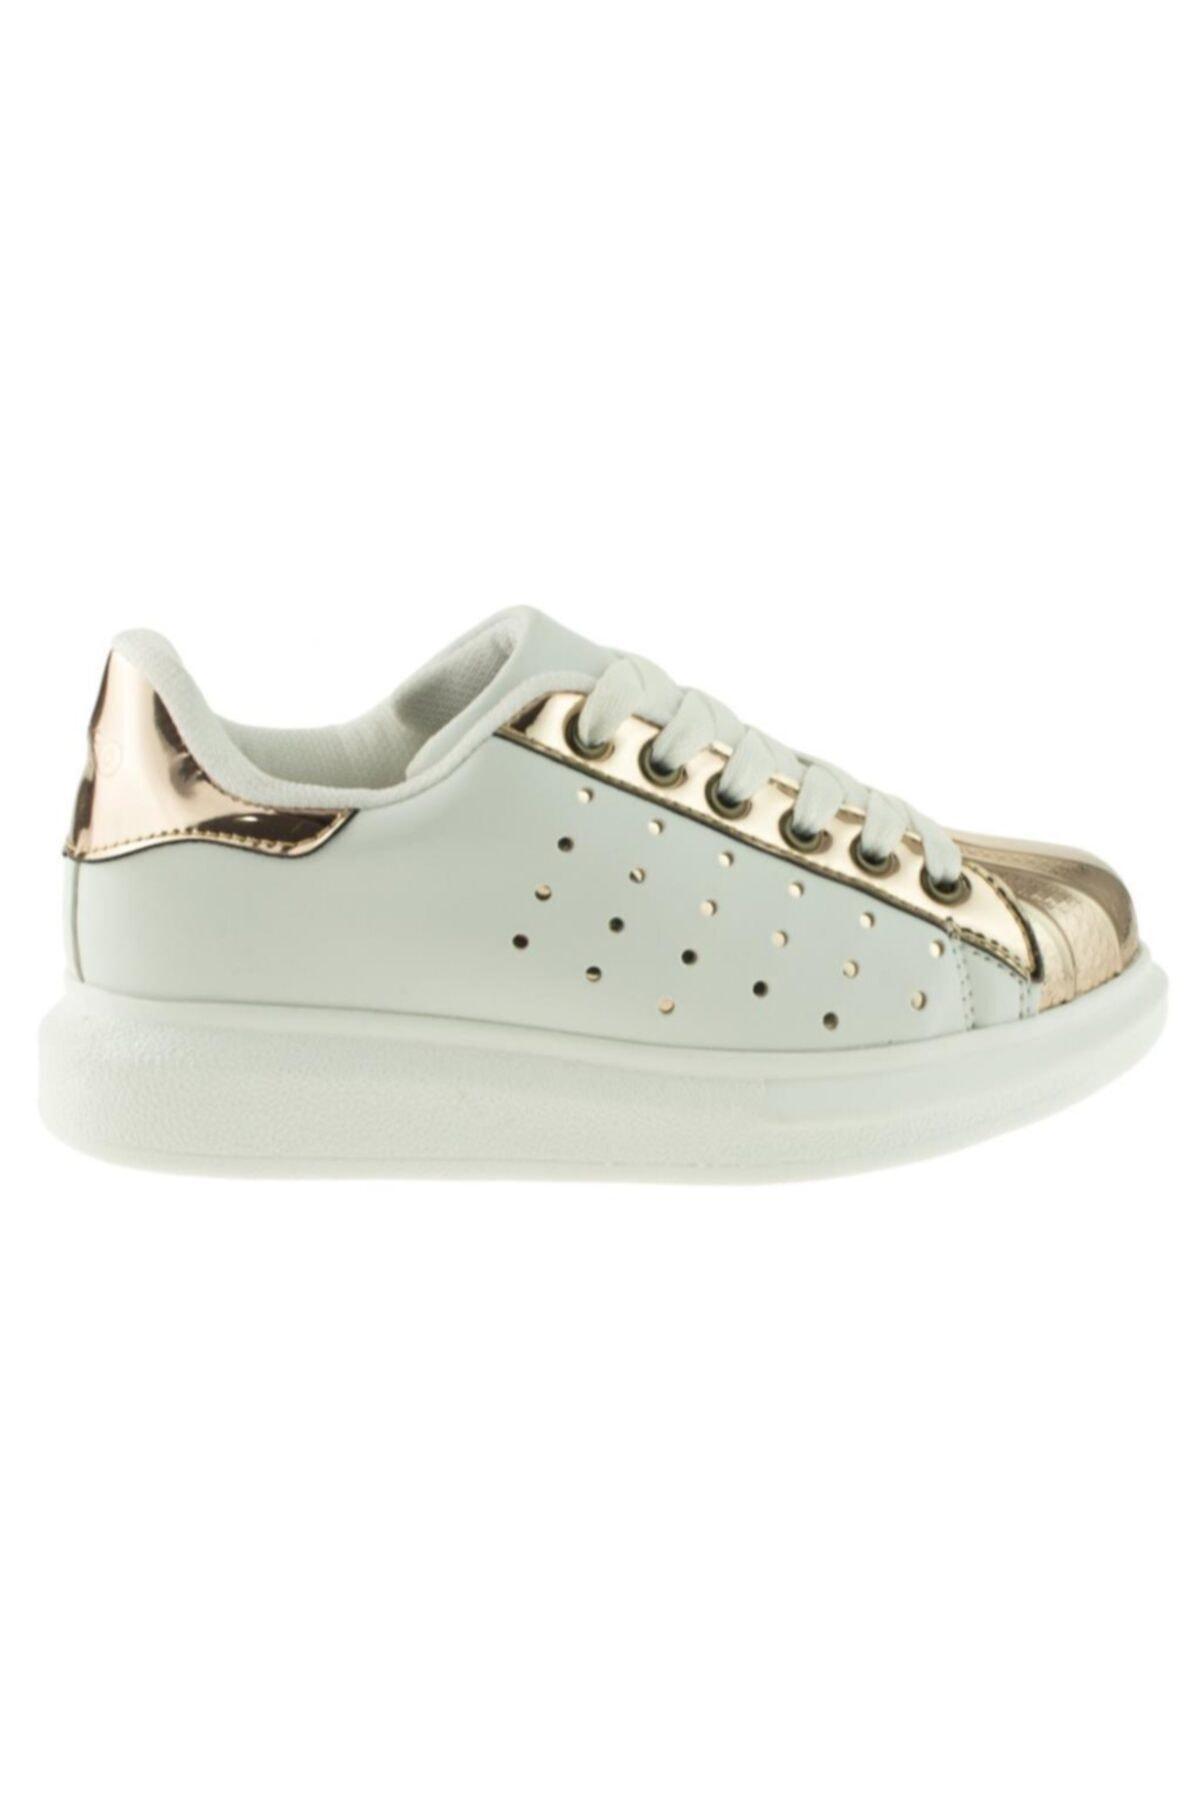 Vicco 938 V 722 Bağcıklı Bronz Spor Ayakkabı 1